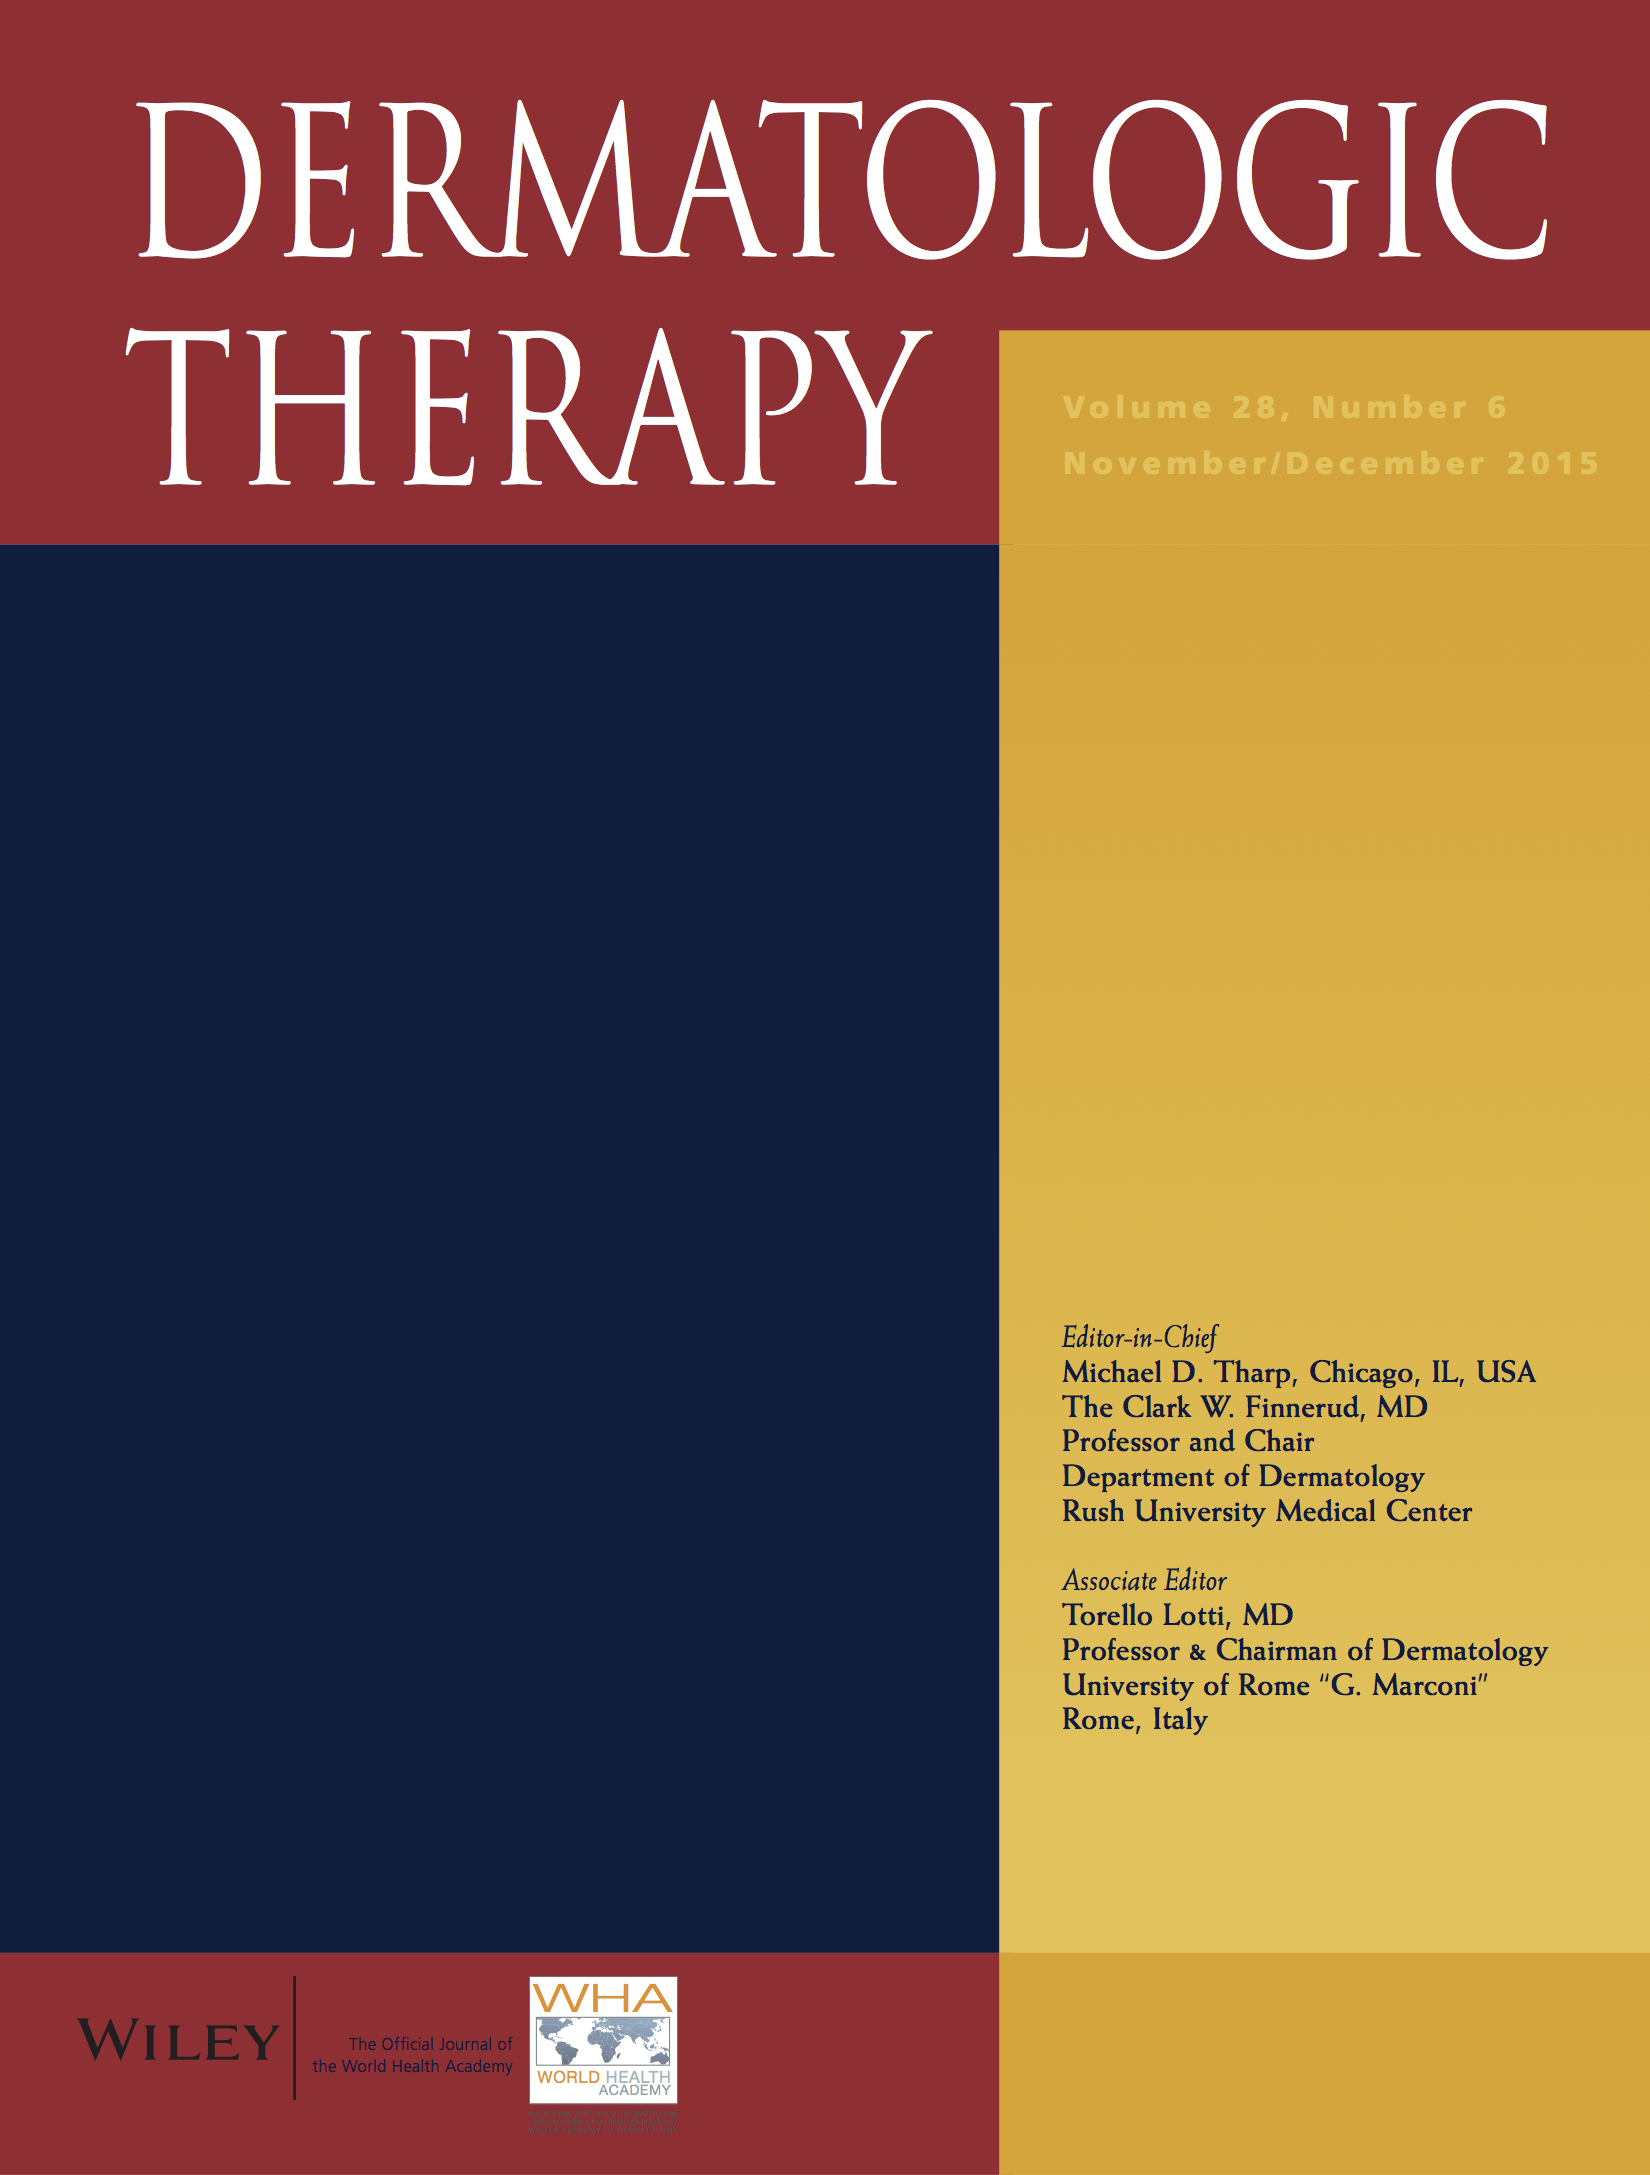 Dermatologic_Therapy.jpg